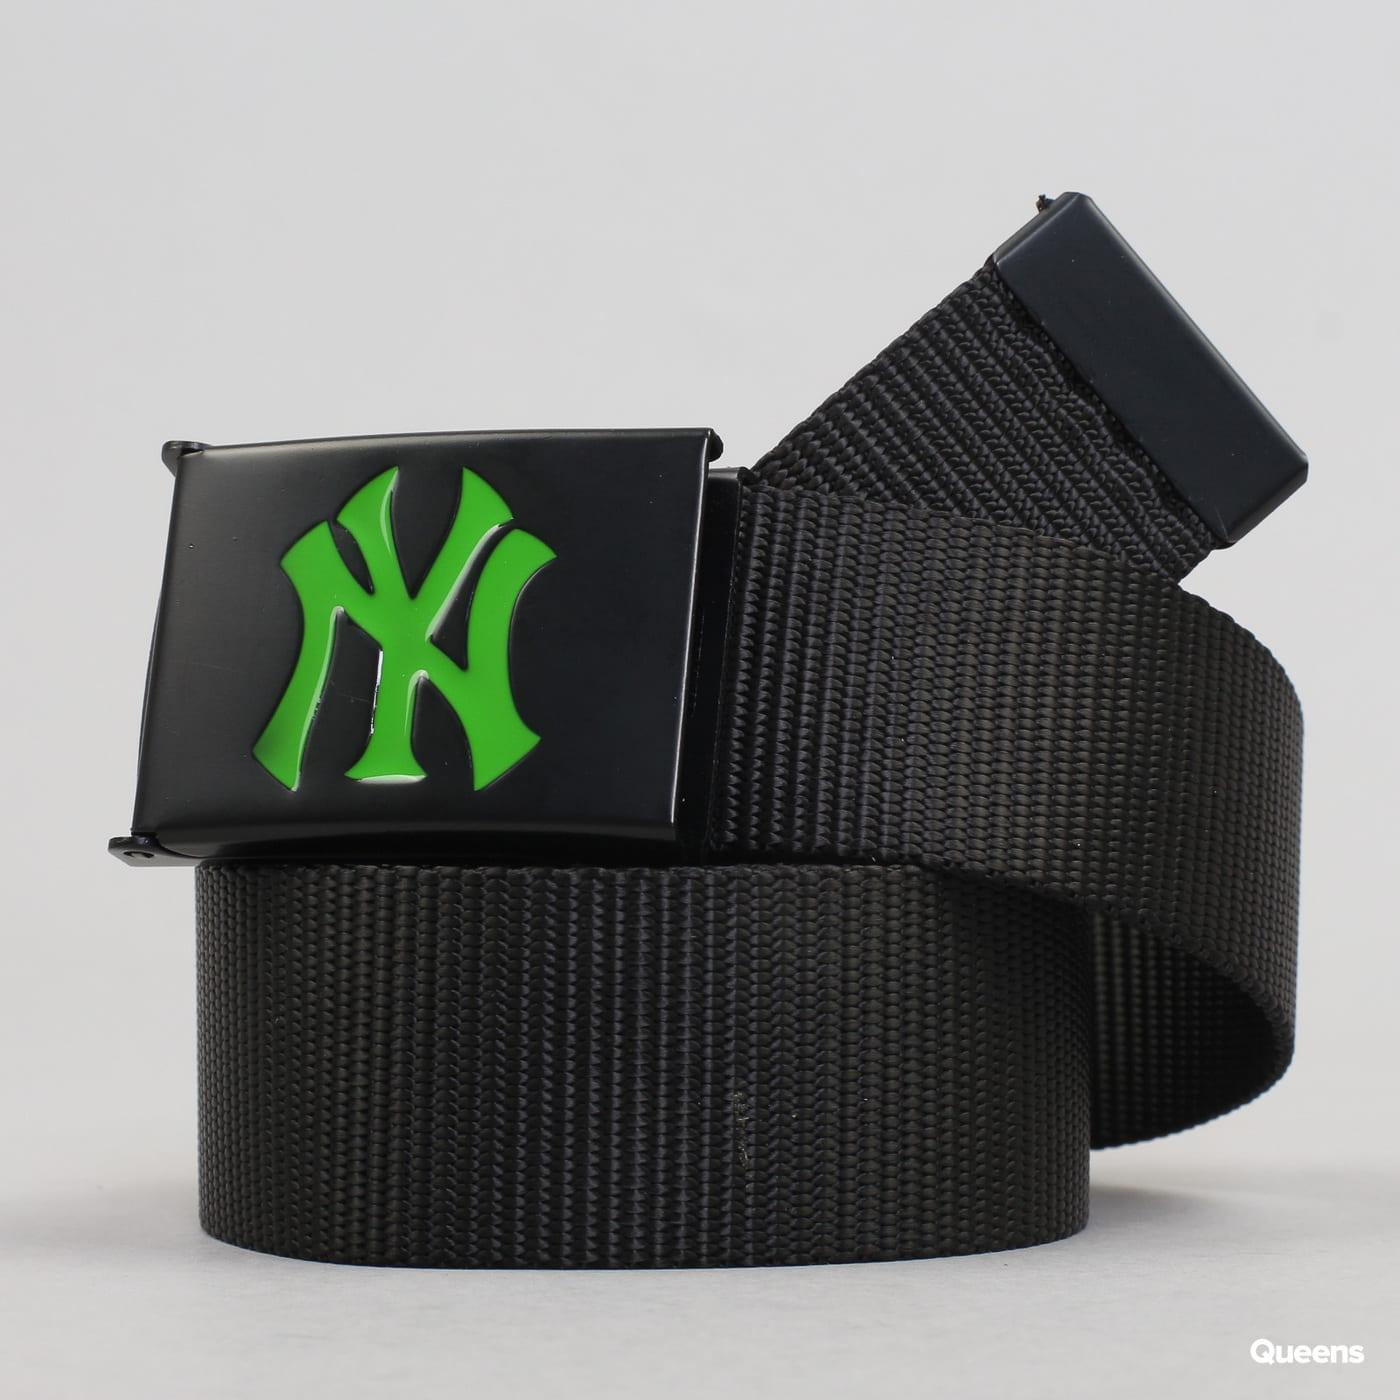 MD MLB Premium Black Woven Belt Single NY black / green